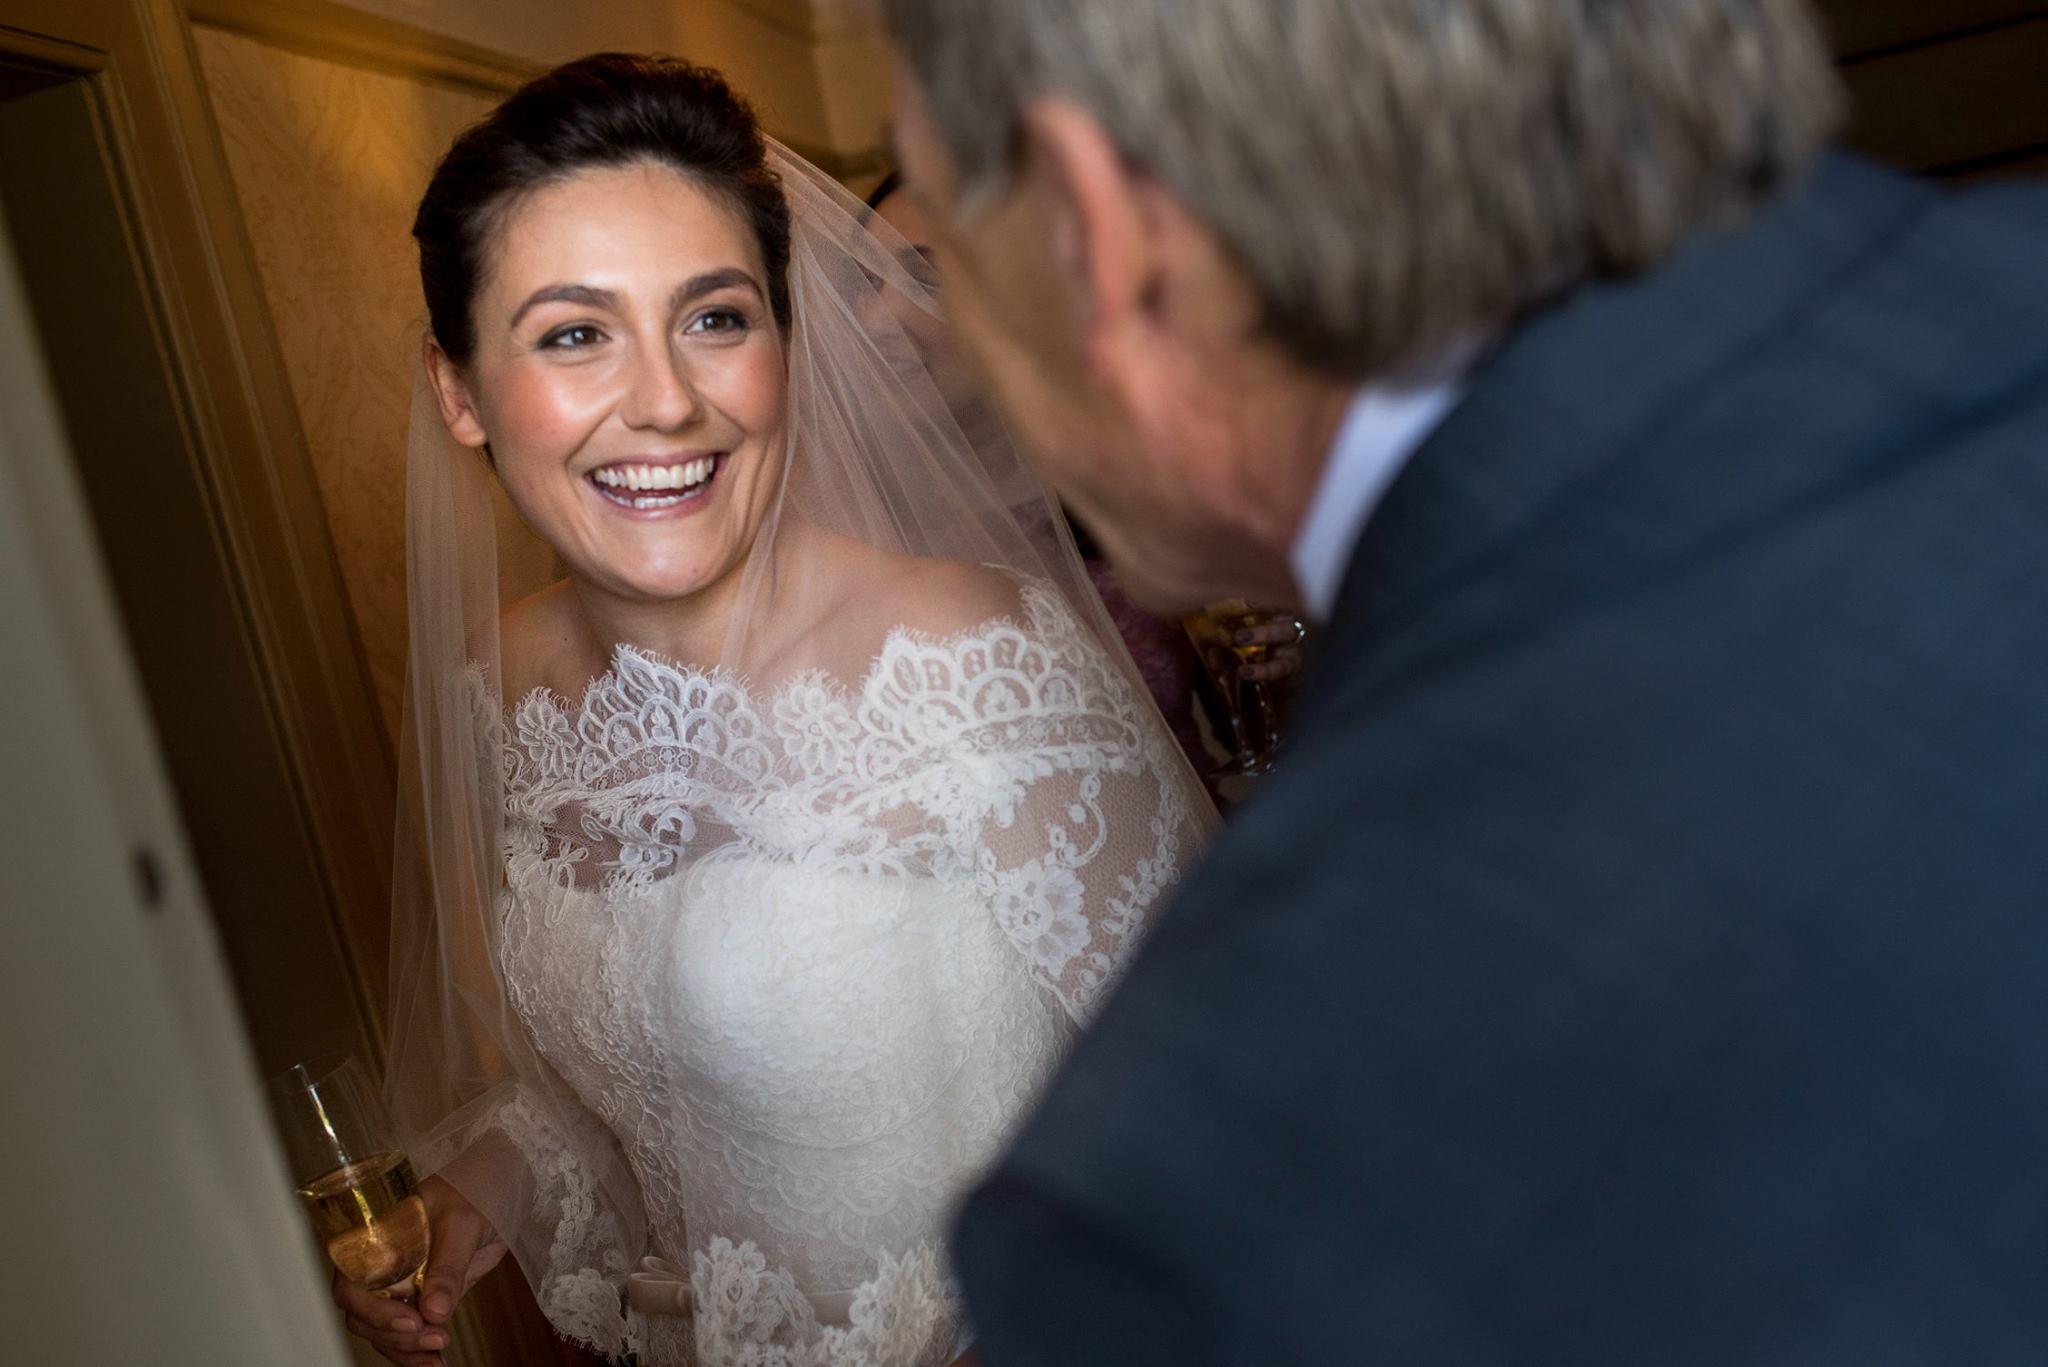 Harriet on her wedding day in 2015